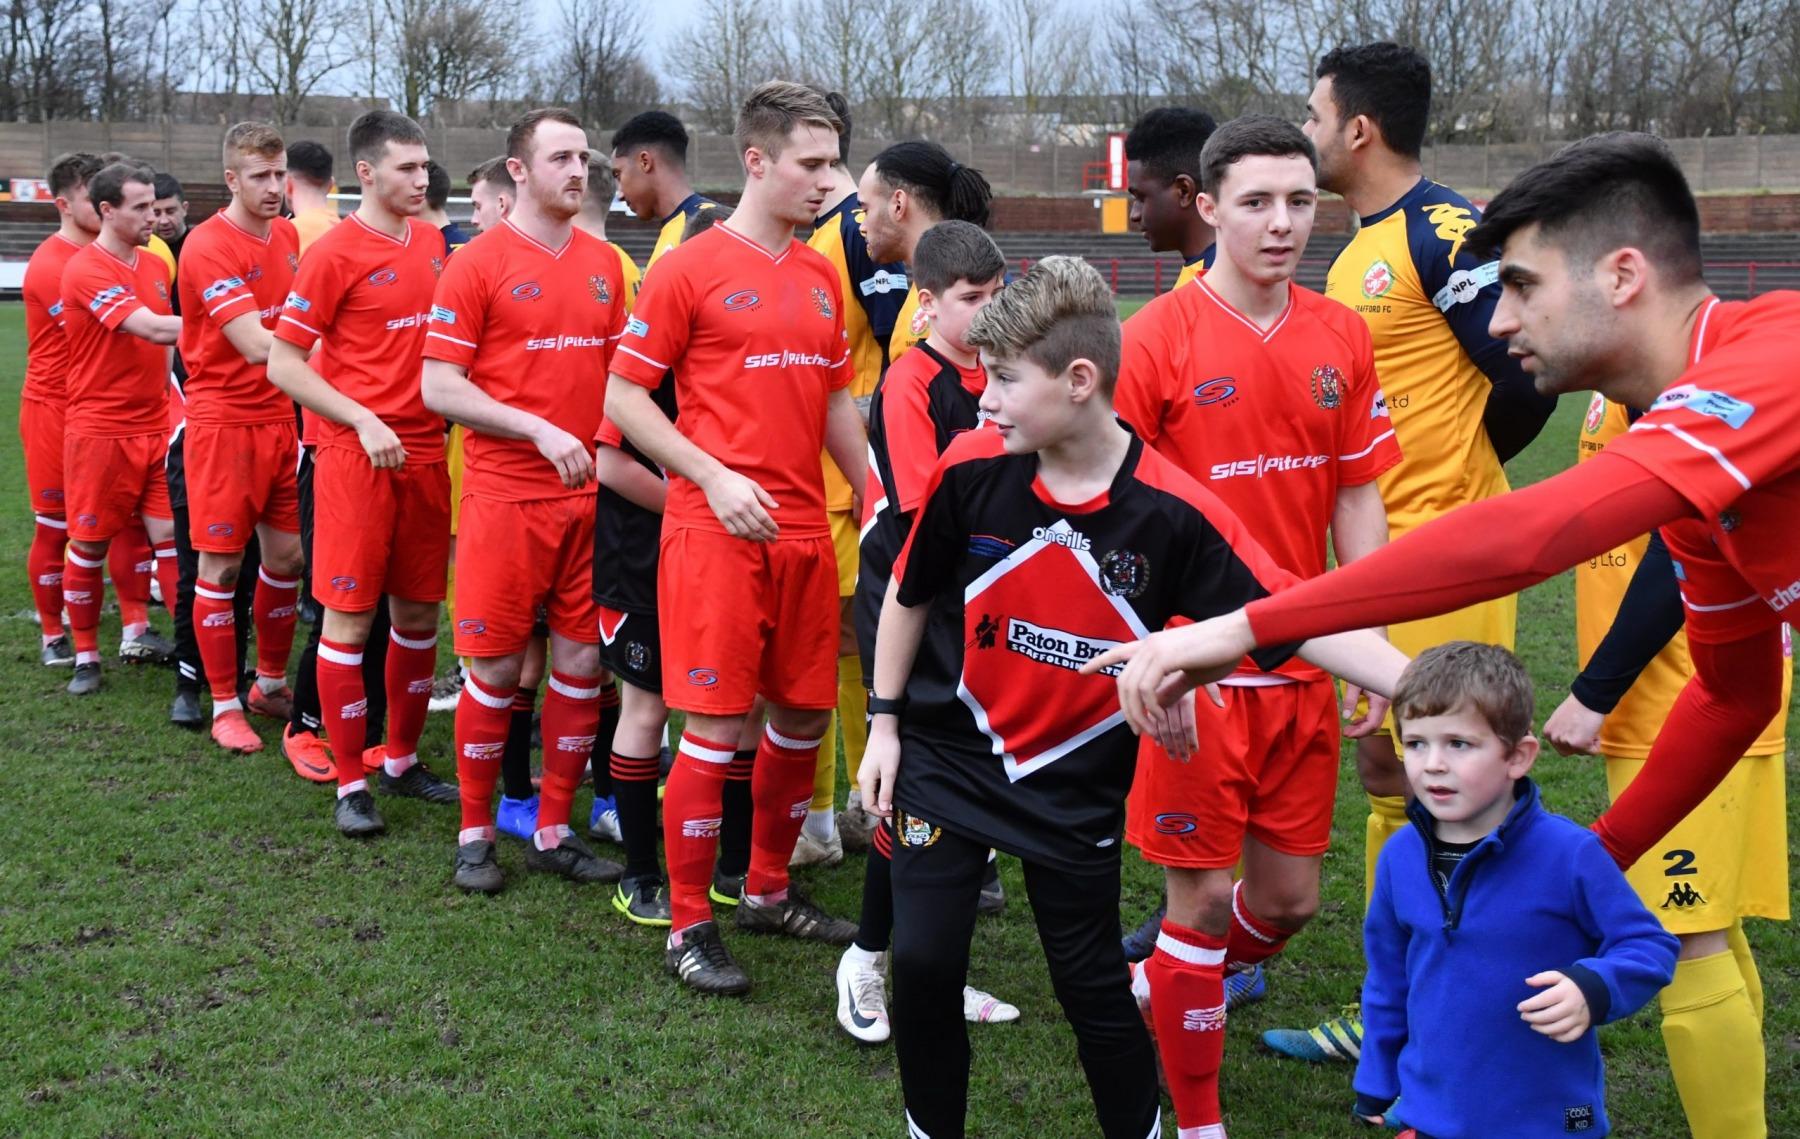 Workington-Reds-v-Trafford-Ben-Challis-1-scaled